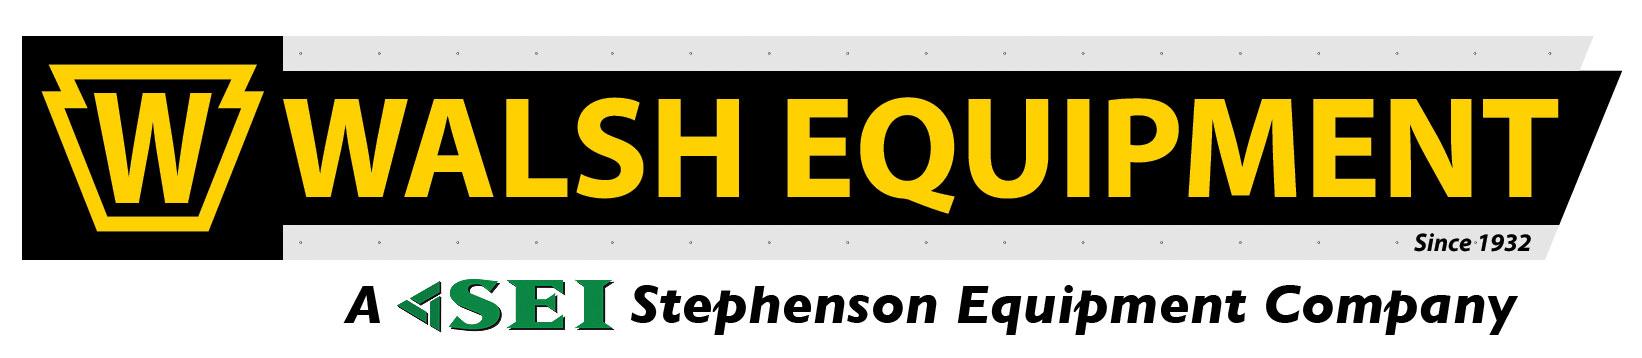 Walsh Equipment / A Stephenson Equipment Company company logo